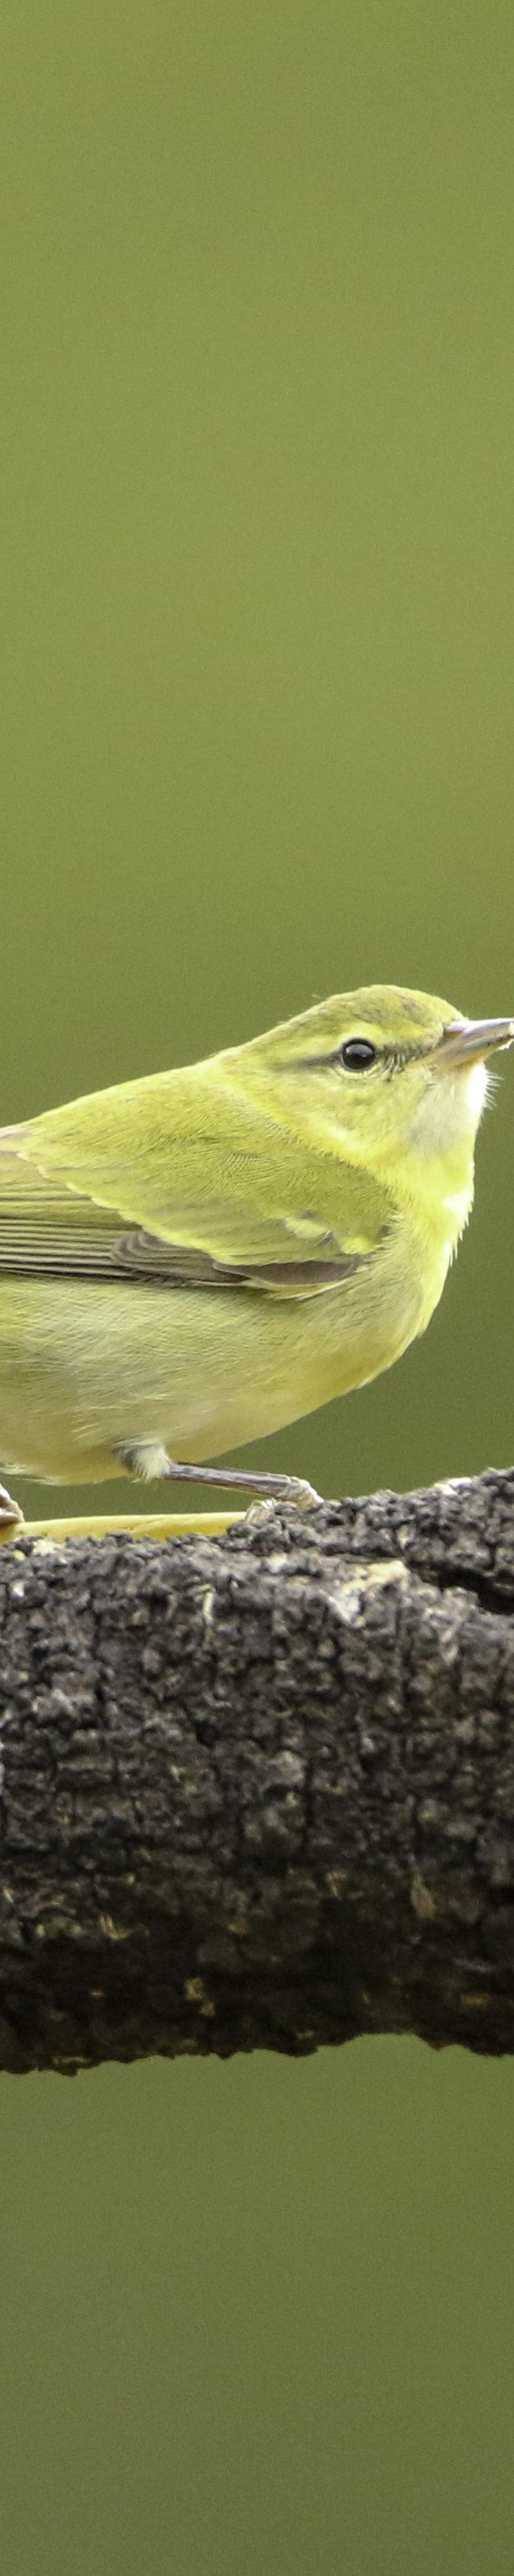 Gele looftiran / Yellow Tyrannulet (Capsiempis flaveola)